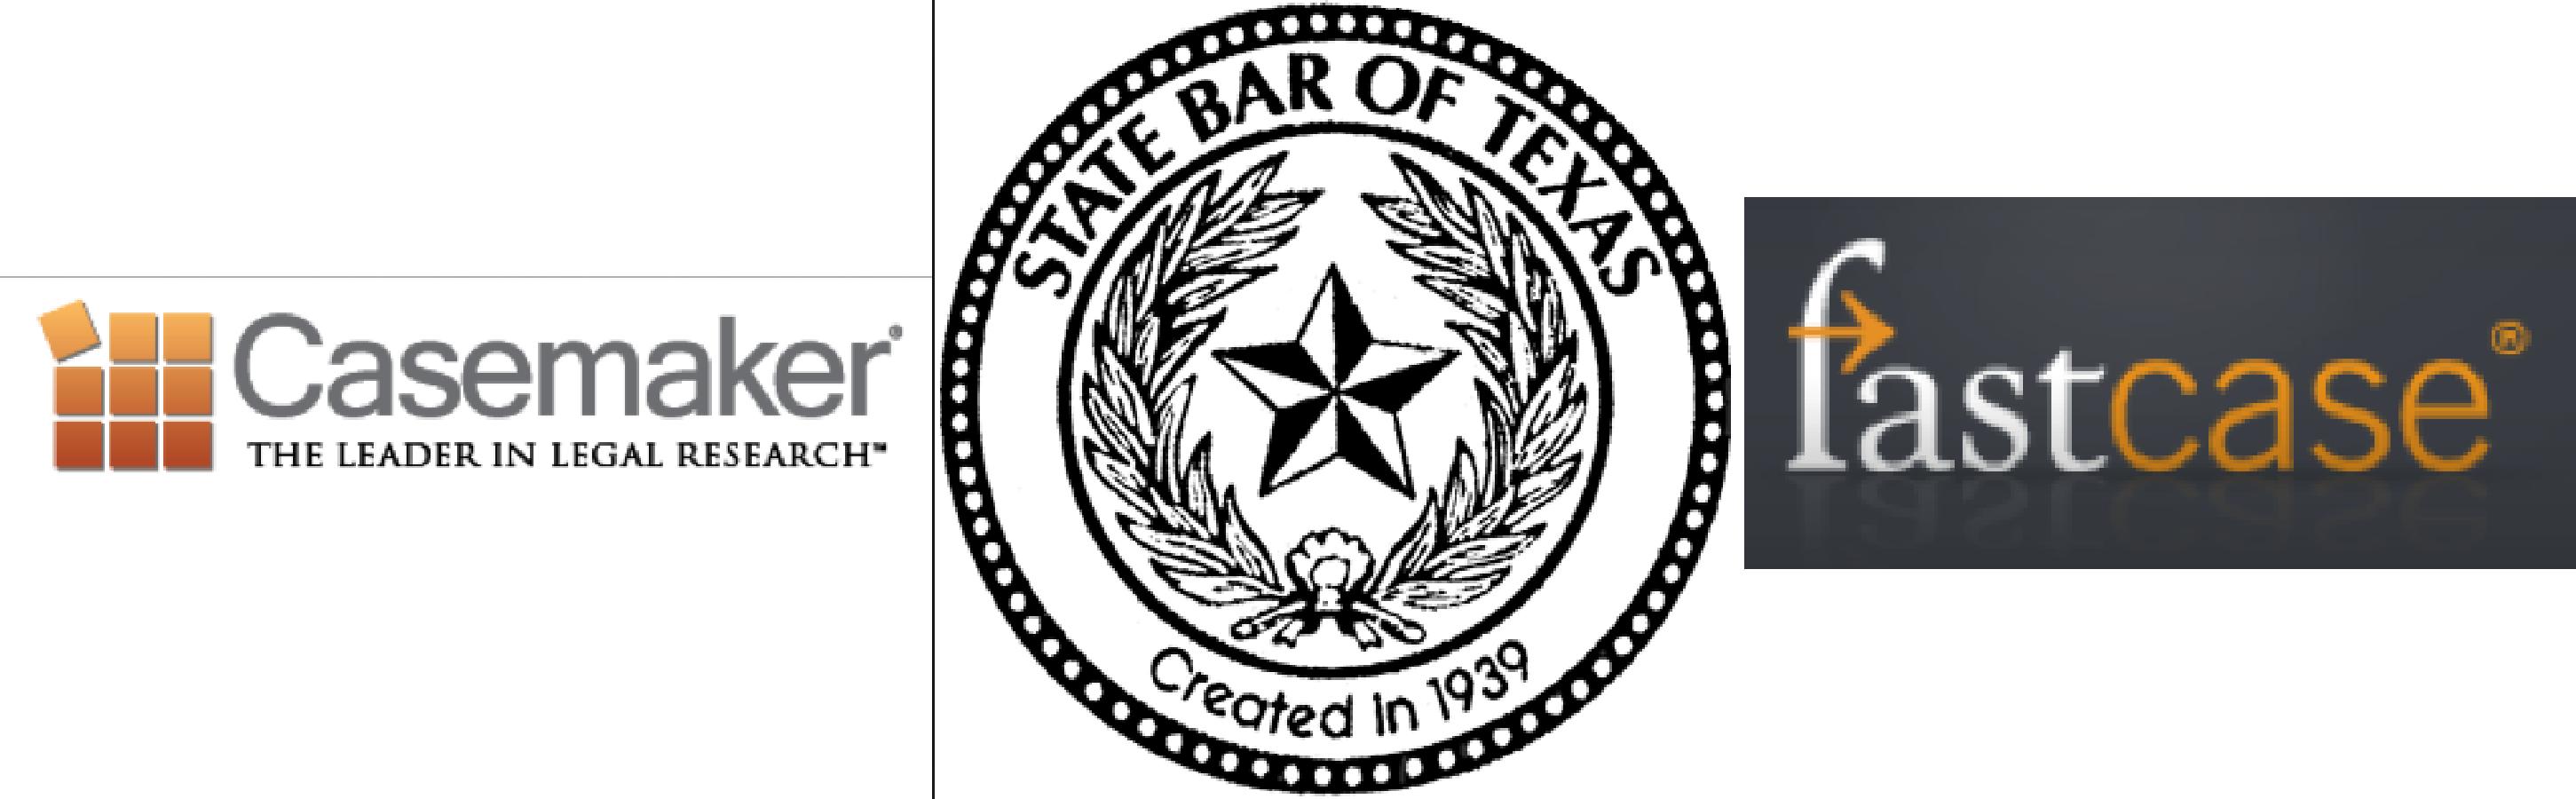 State Bar of Texas Logo Texas Bar Legal Research